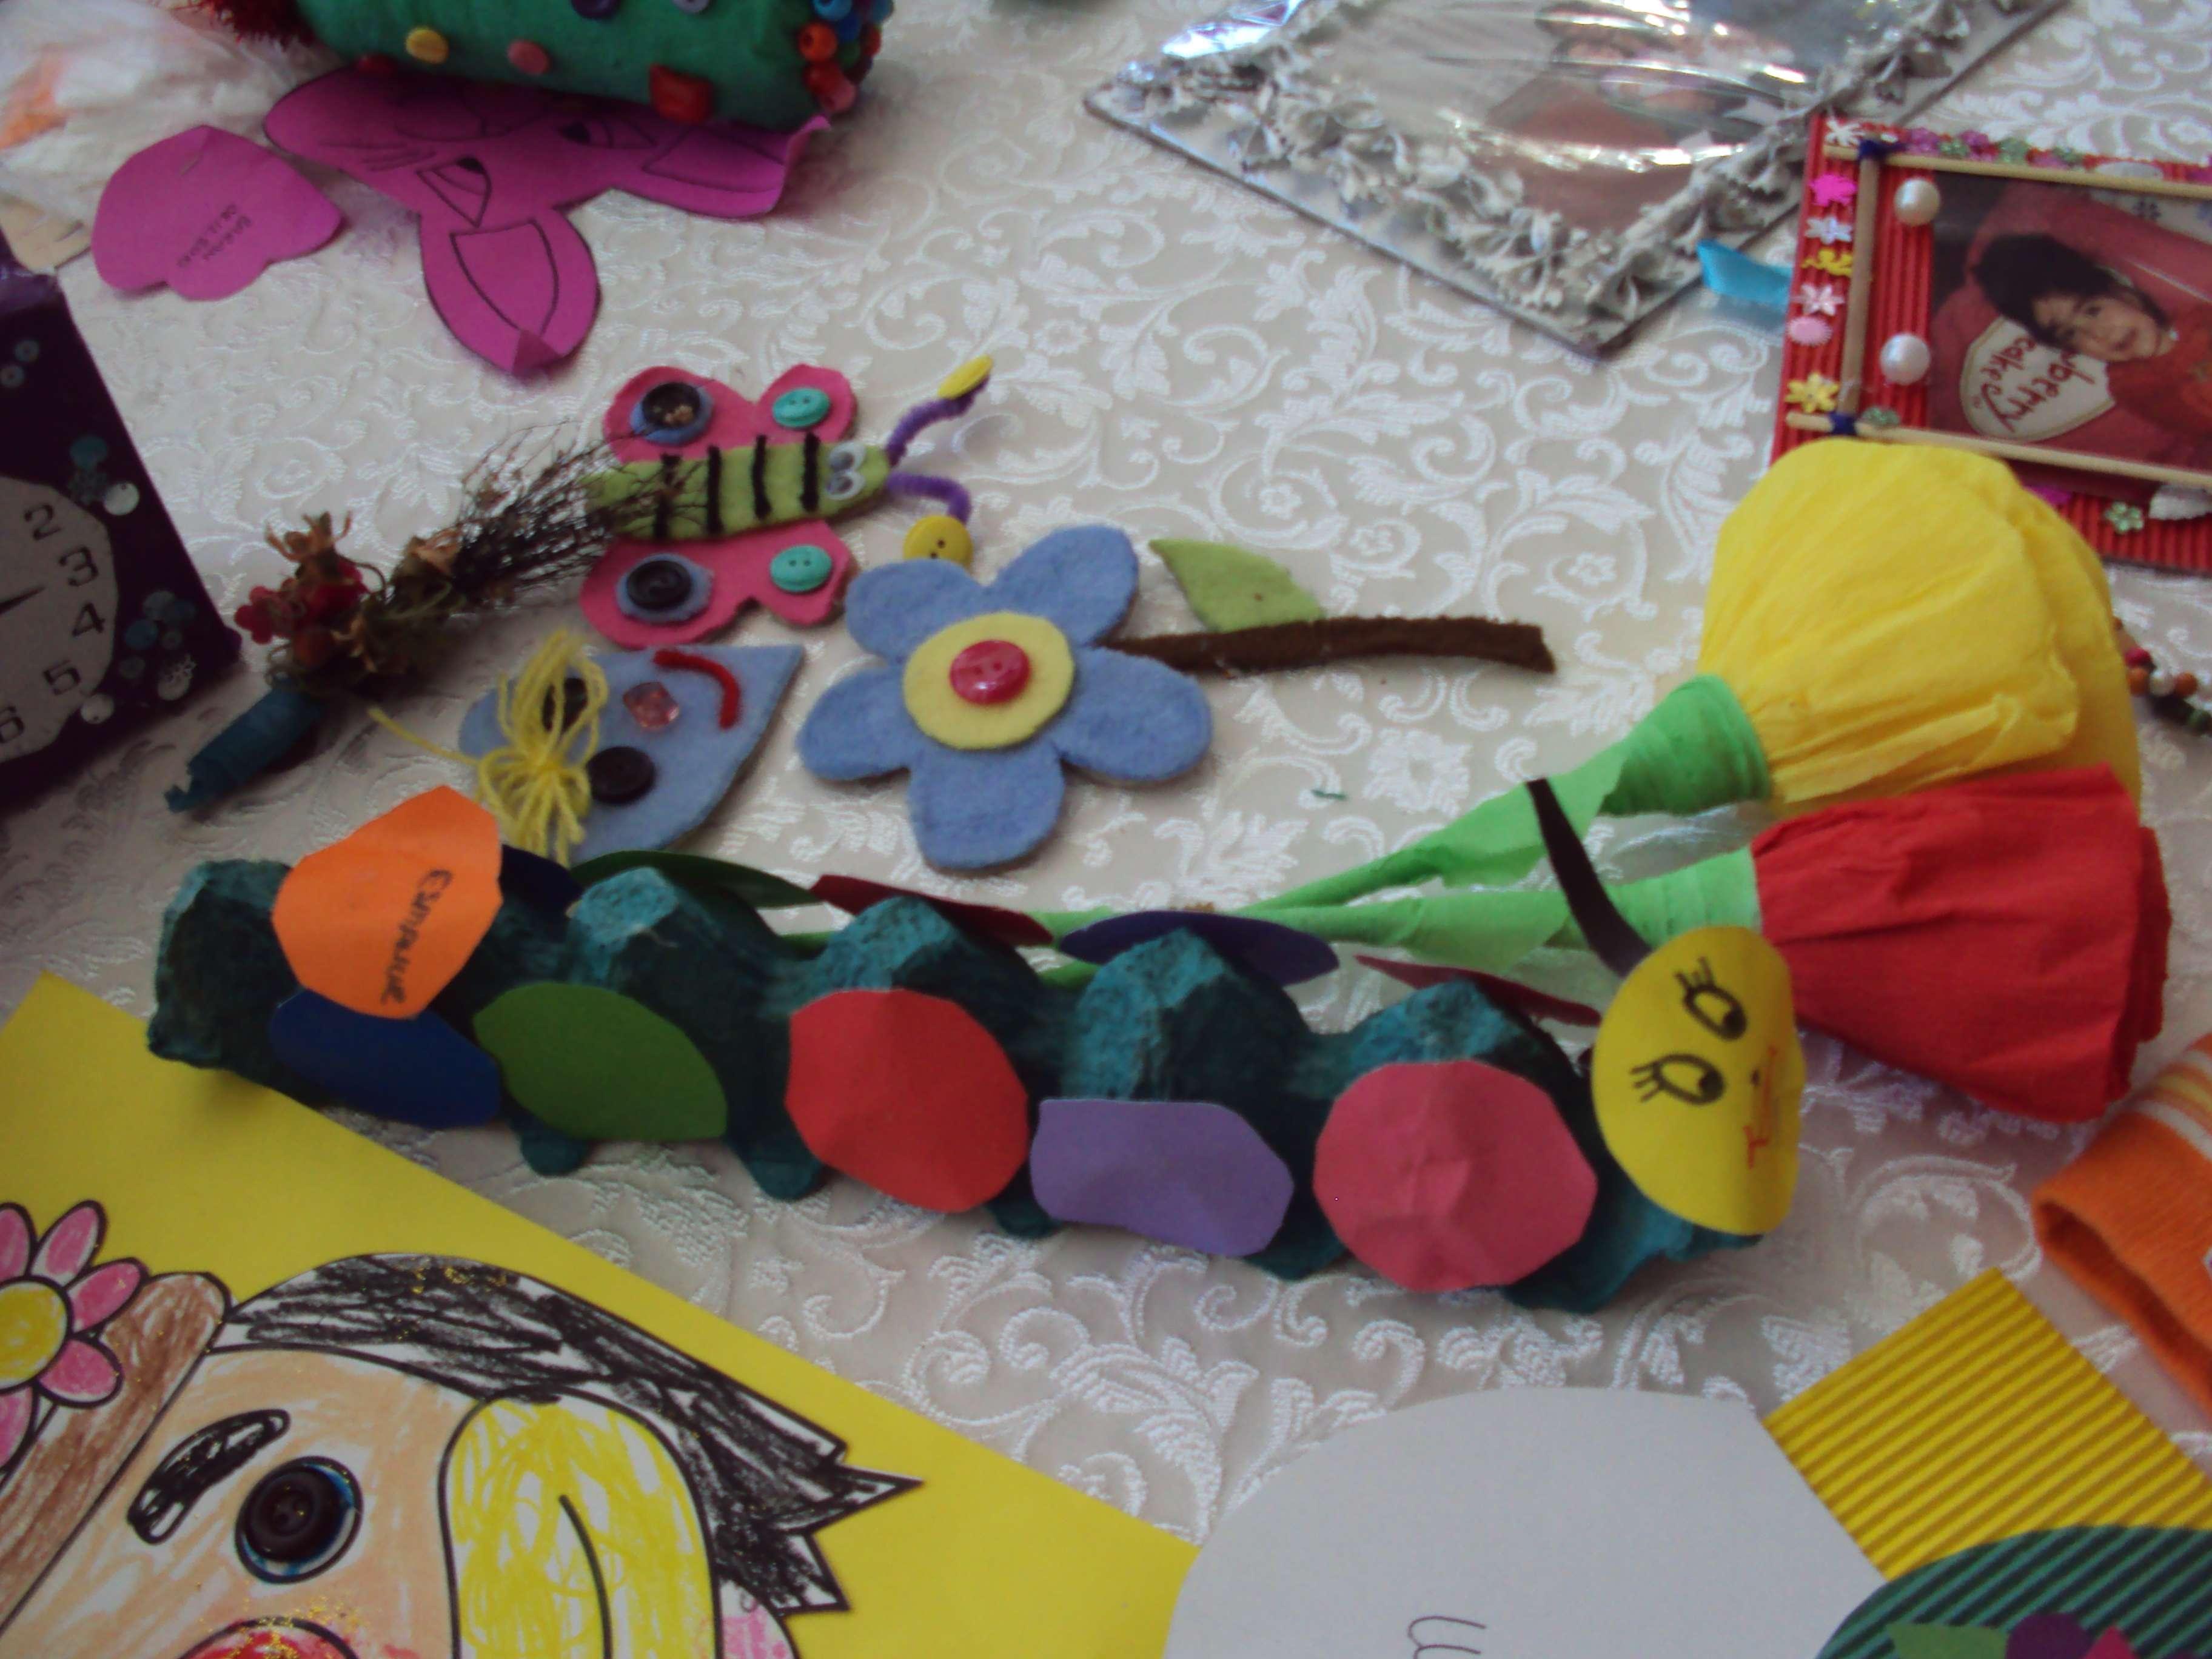 egg carton caterpillar craft idea for kids